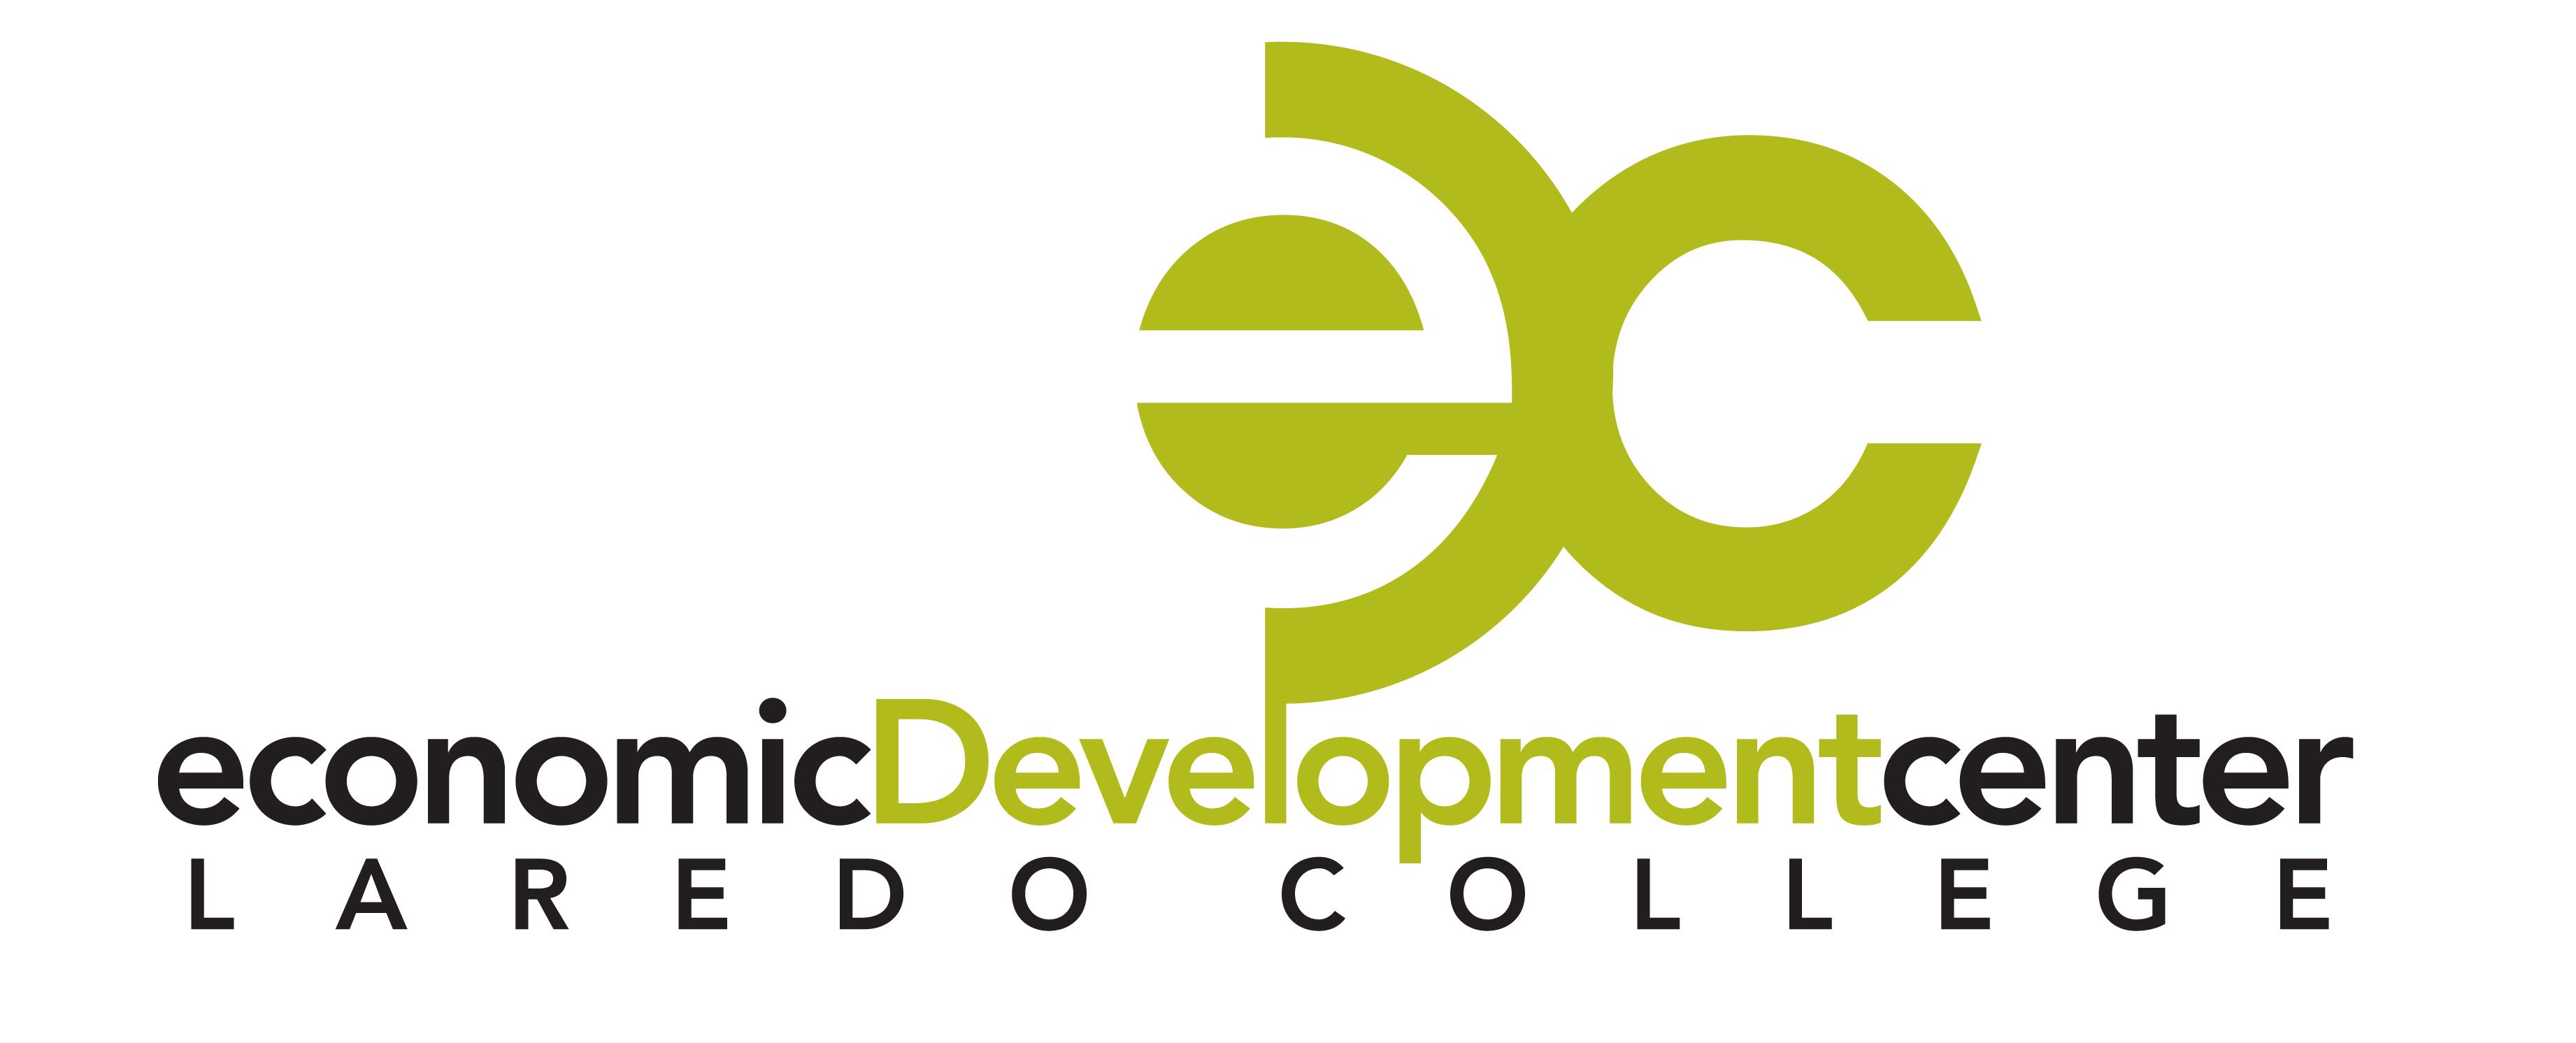 Laredo Economic Development Corporation – The business